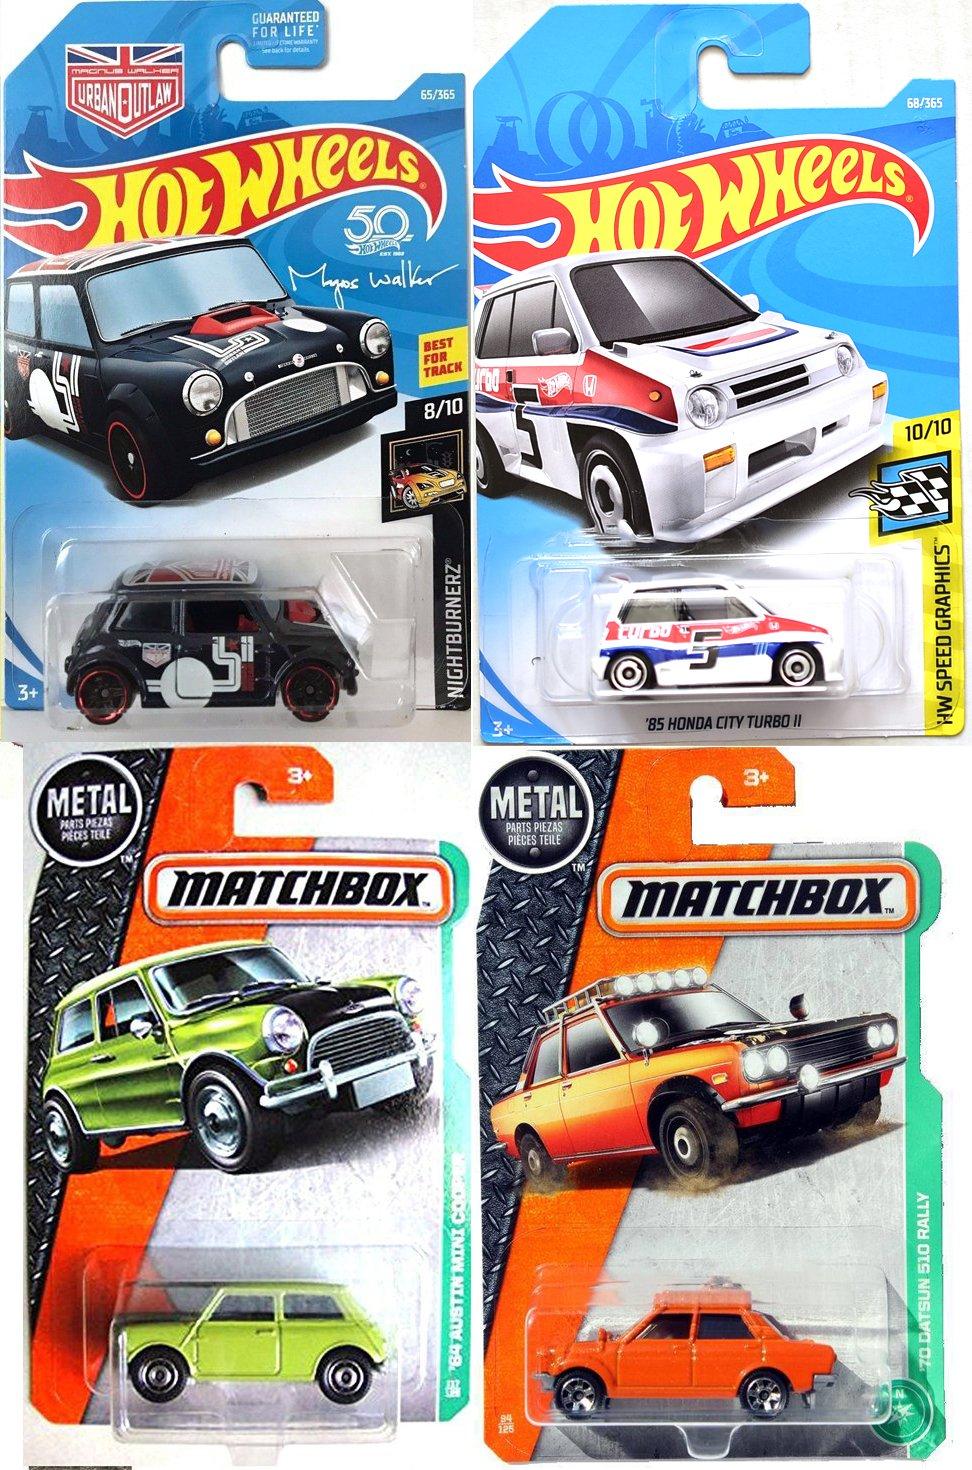 Galleon Mini City Car Collection 2018 Hot Wheels 85 Honda Turbo